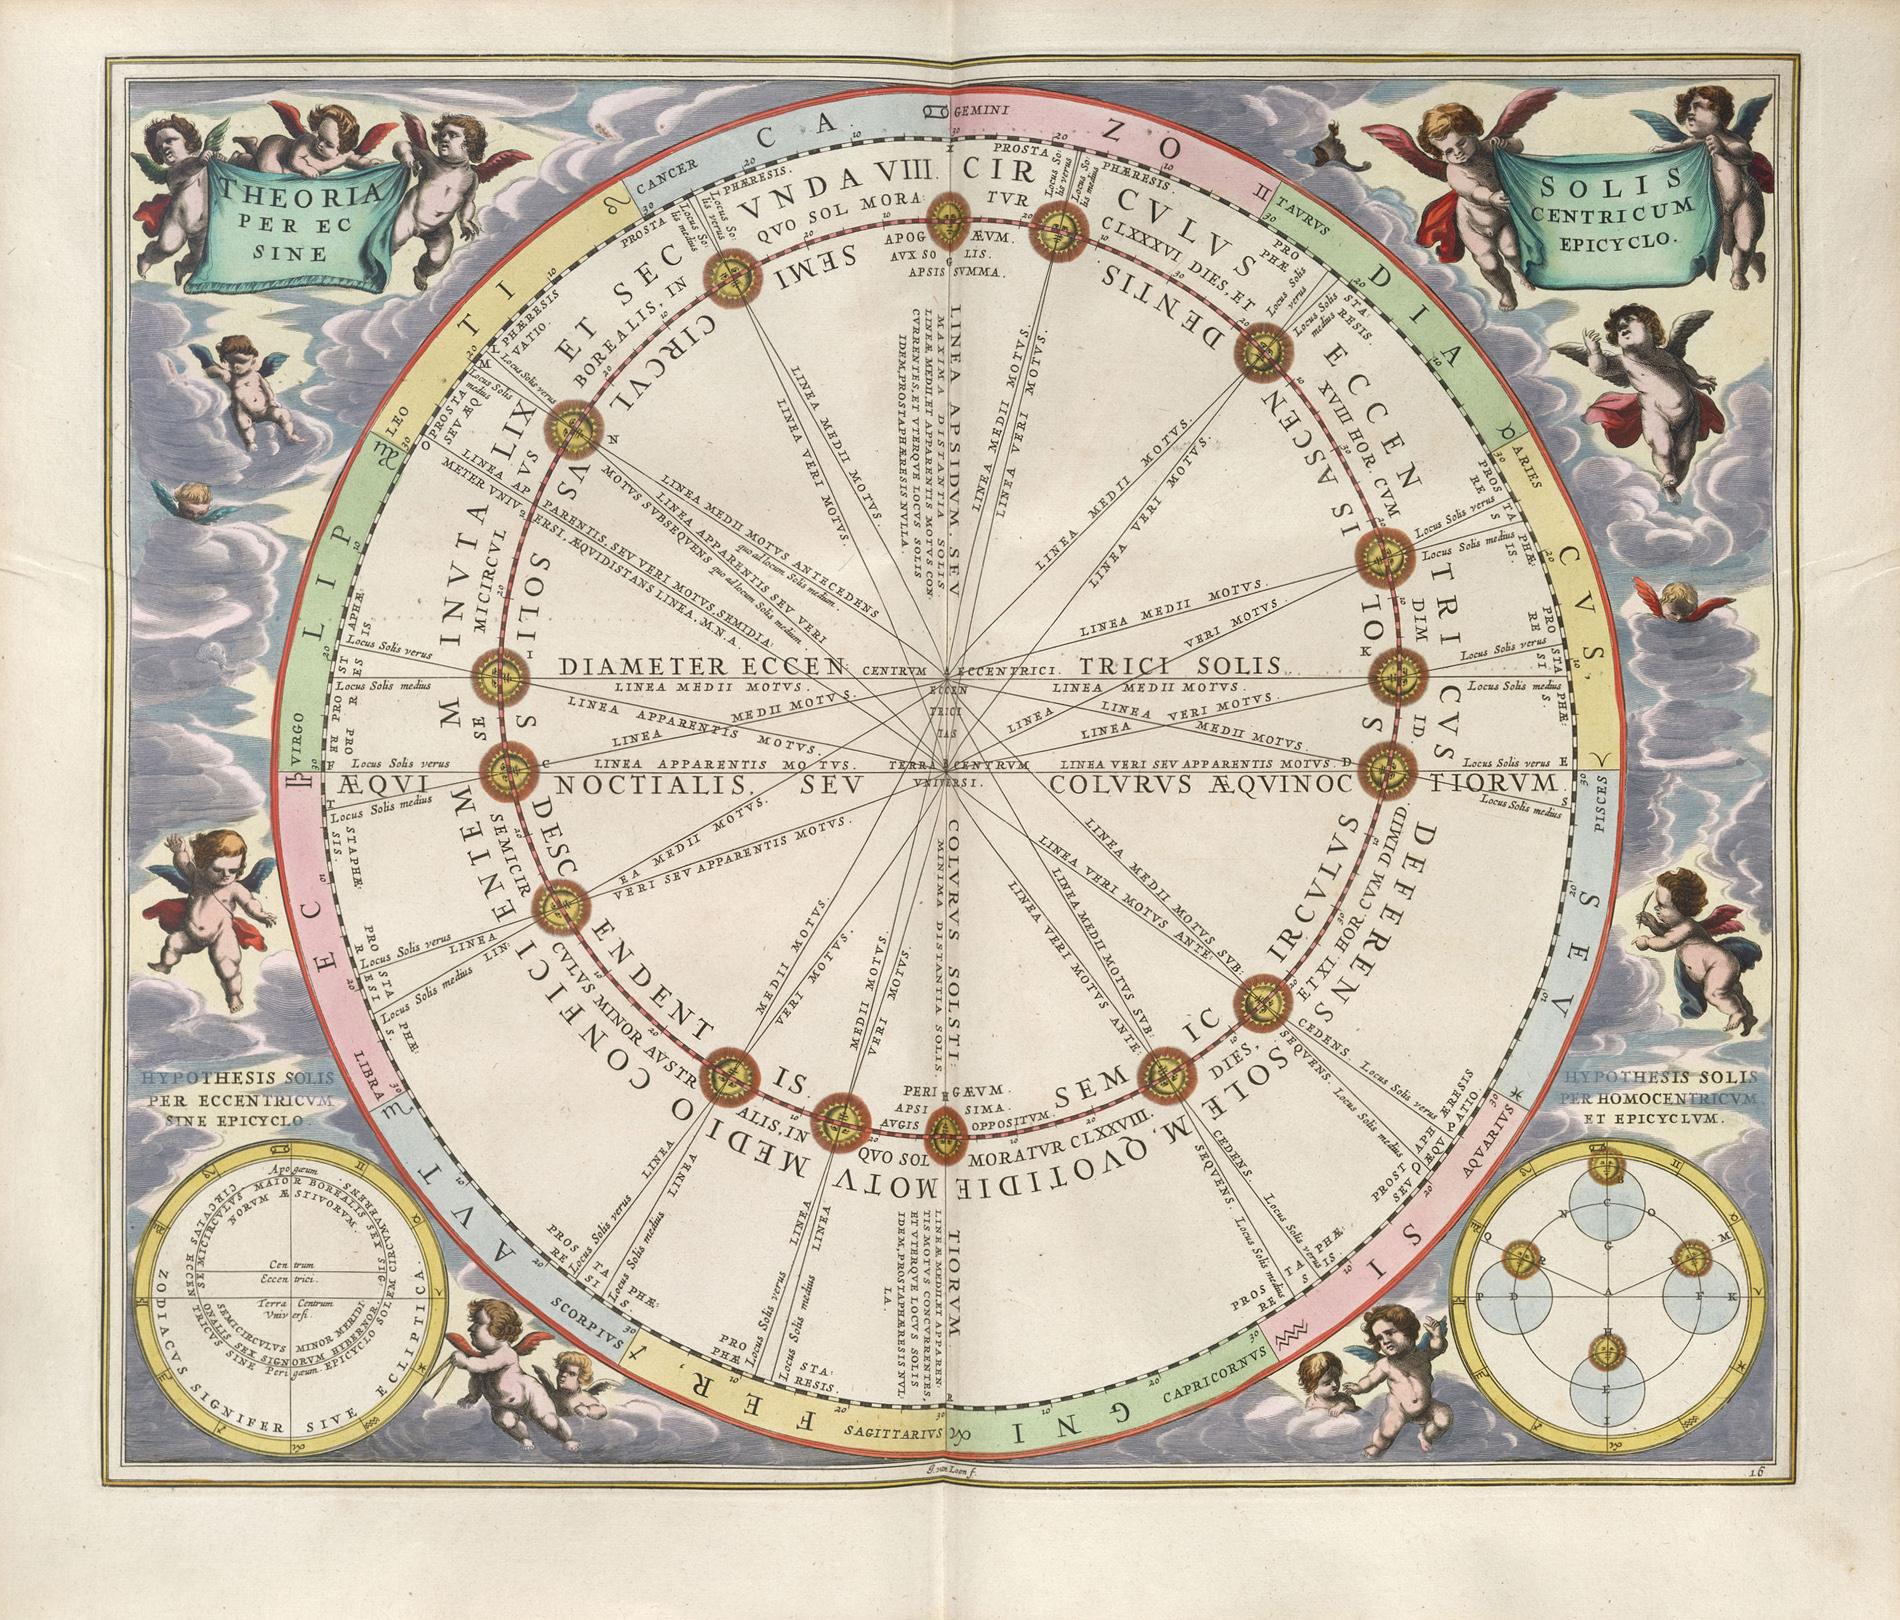 sm-Geocentricite-terre-centre-univers-carte-17